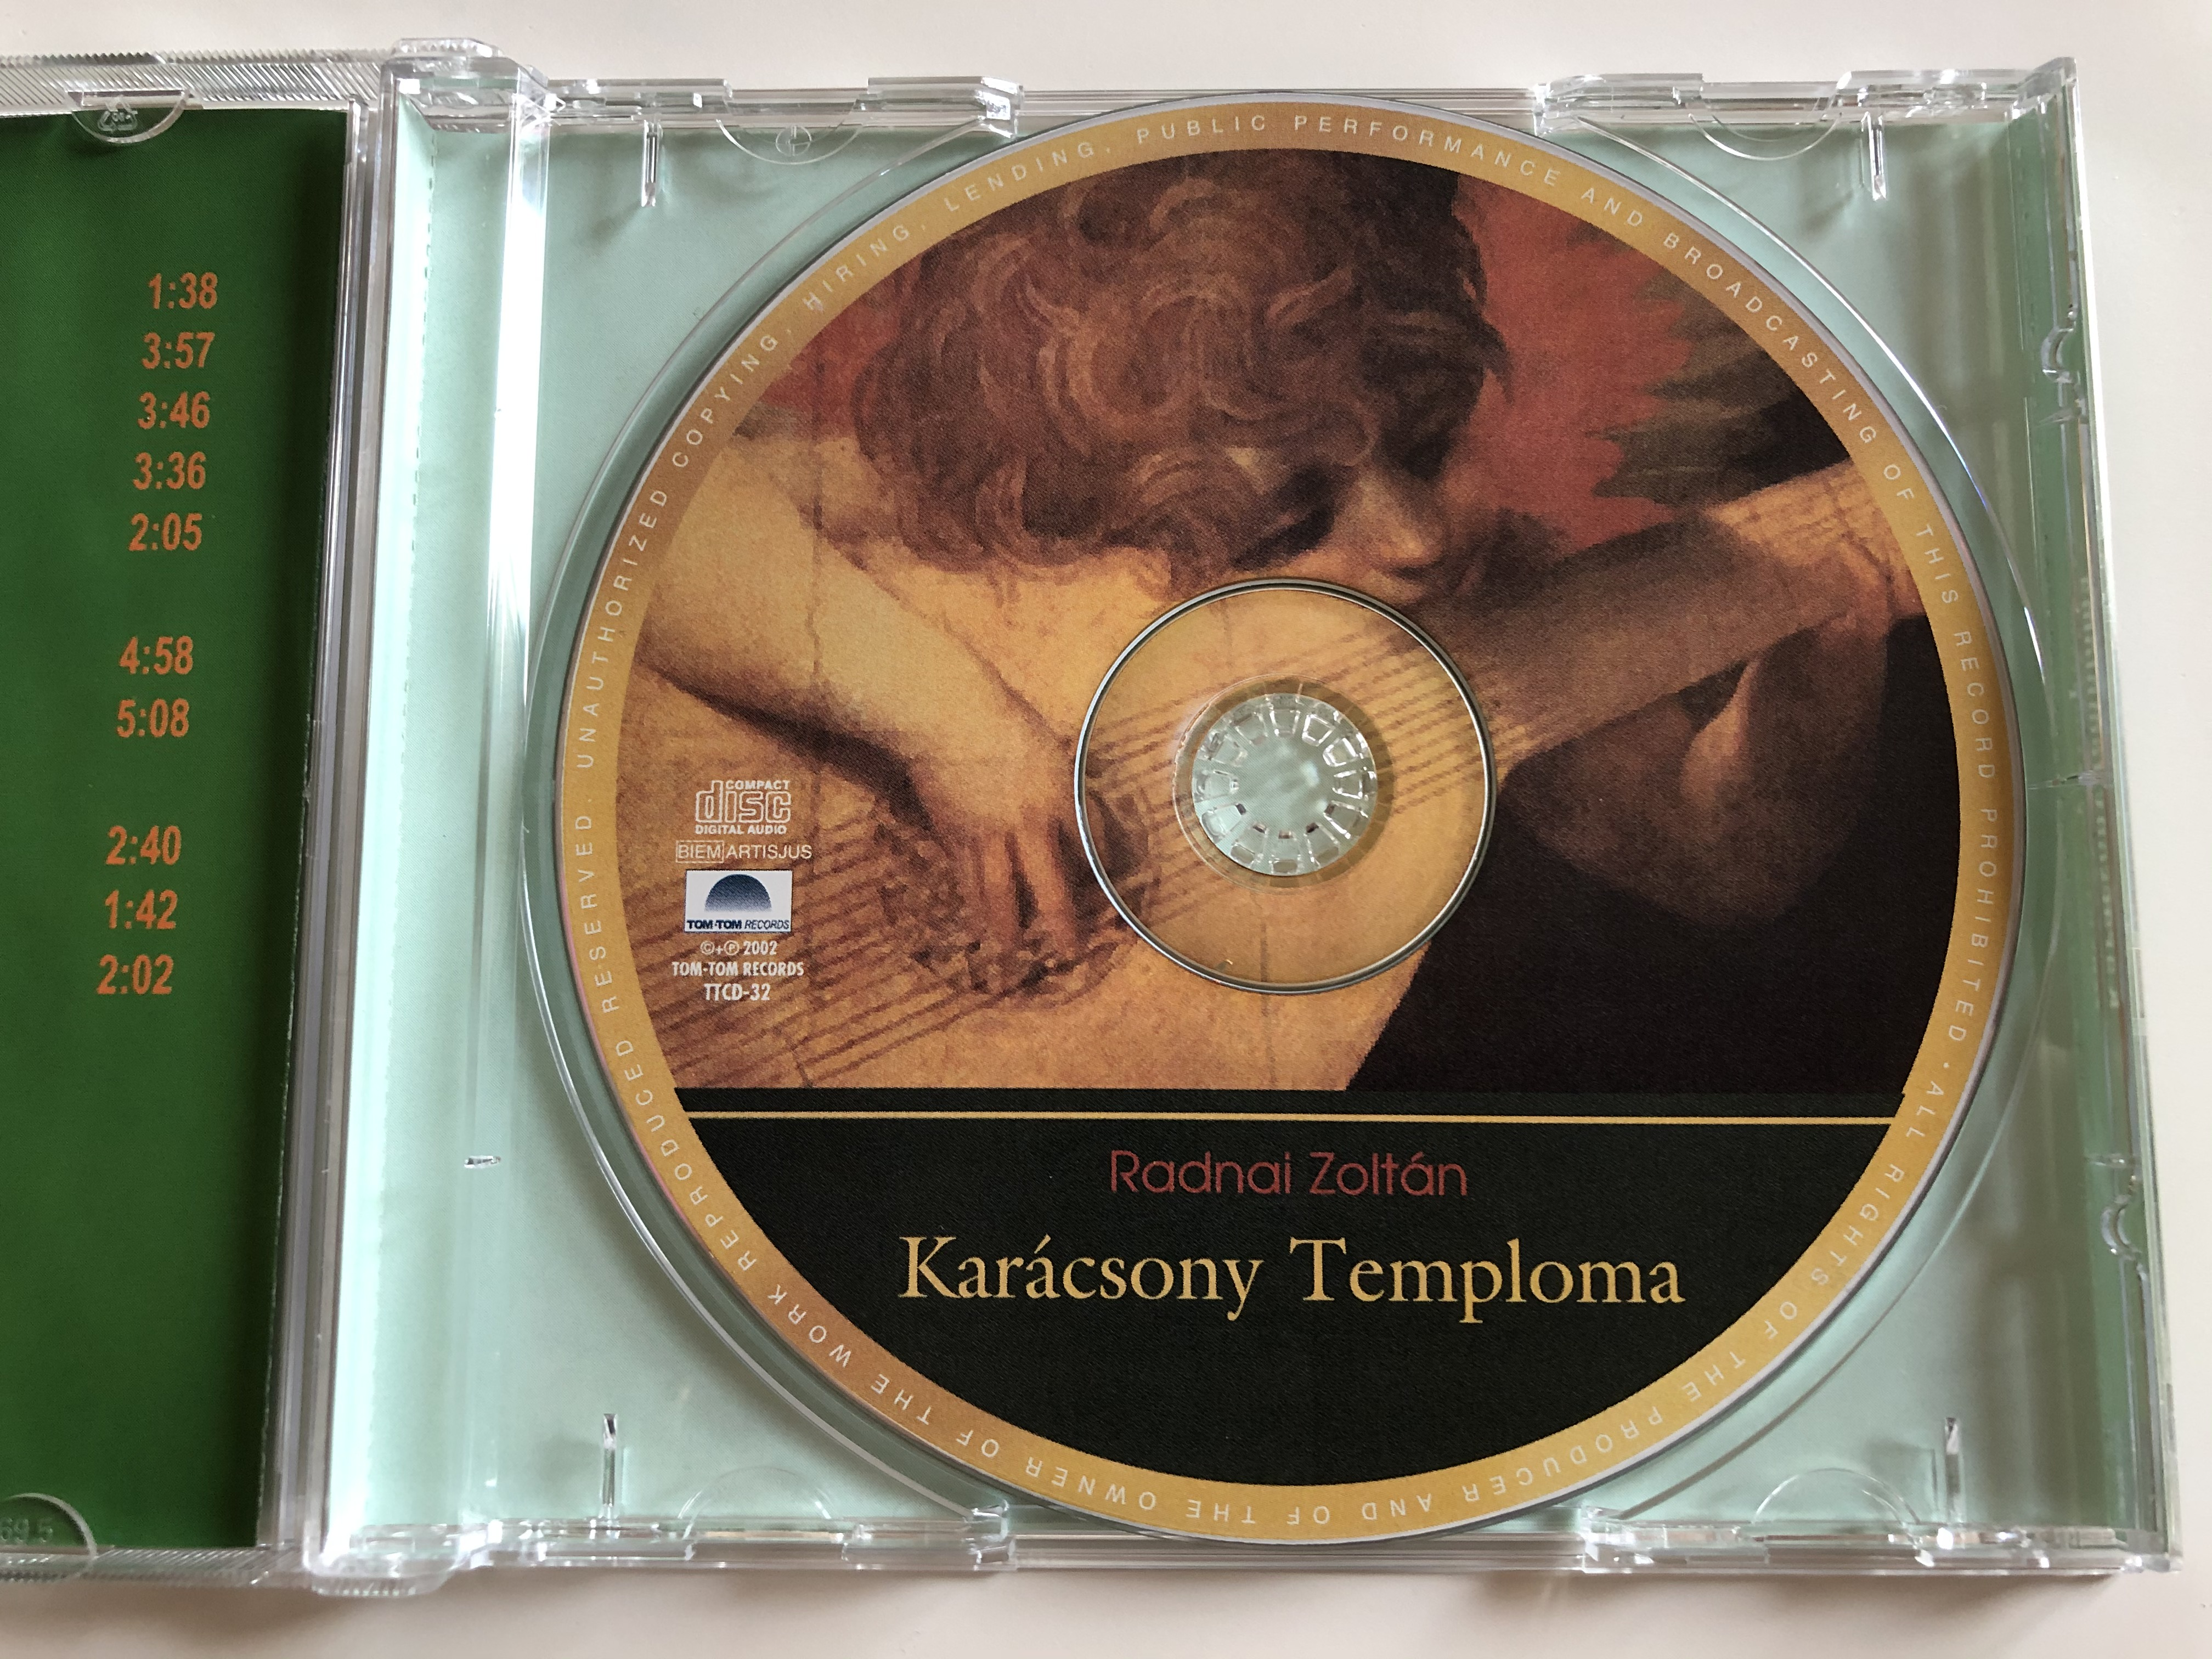 radnai-zolt-n-kar-csony-temploma-hagyom-nyos-s-klasszikus-kar-csonyi-dallamok-tom-tom-records-audio-cd-2002-ttcd-32-4-.jpg